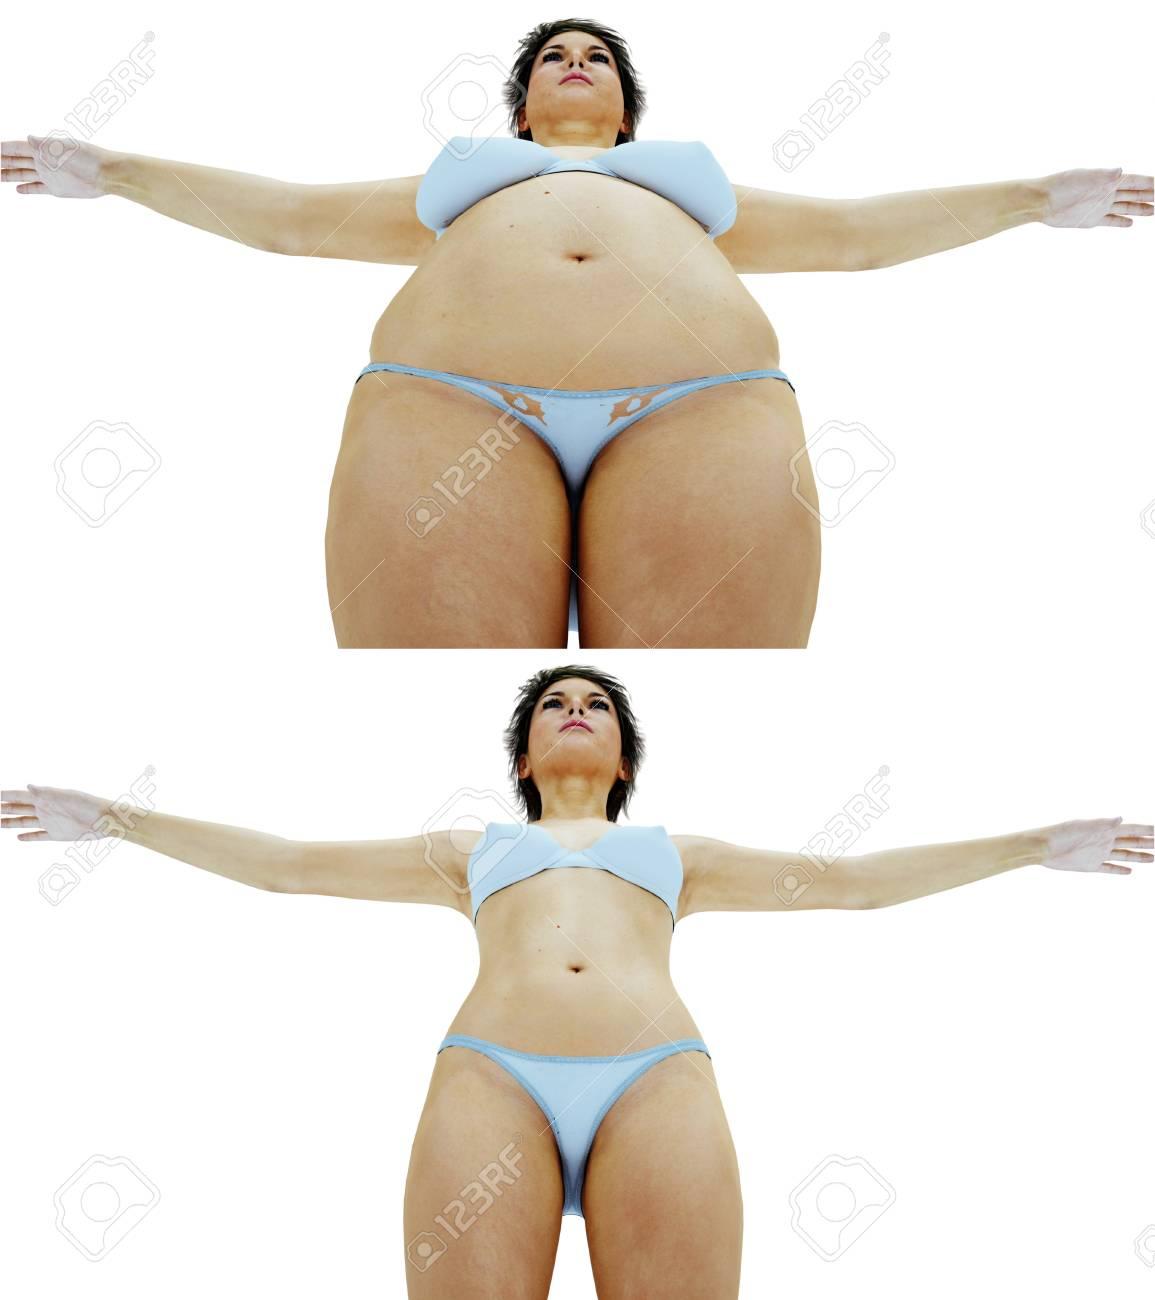 photos de grosses femmes